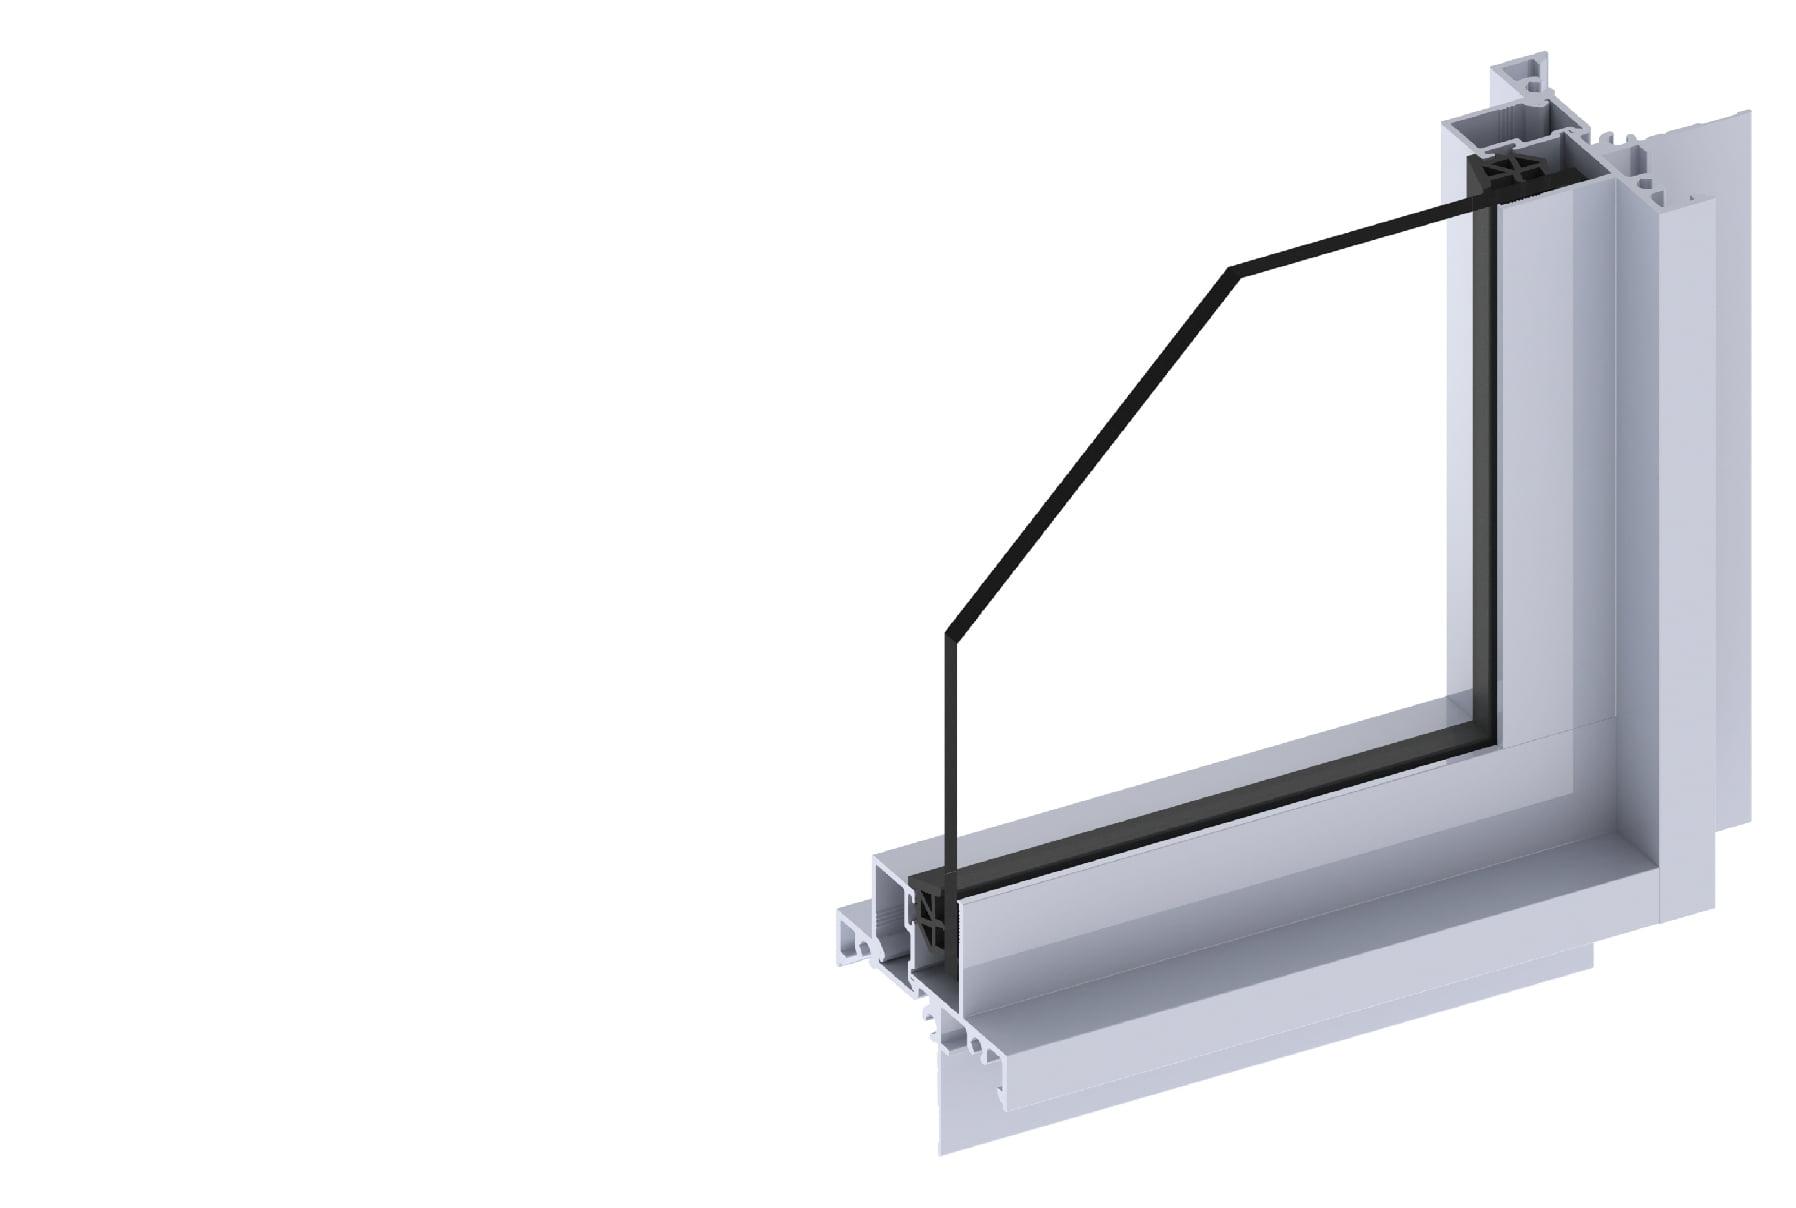 Horizon fixed window section